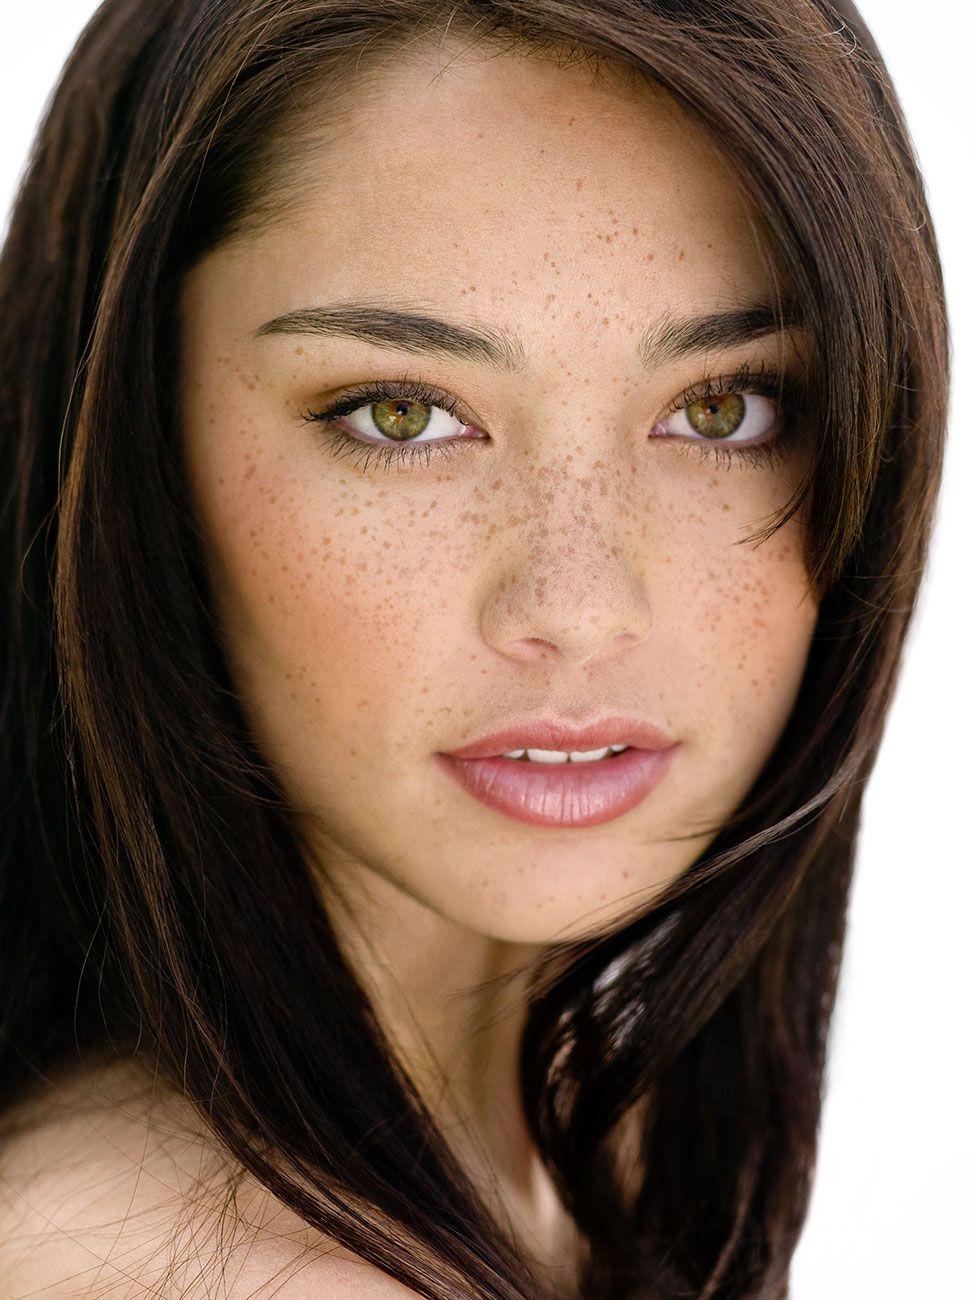 Model Brandi Bondoc Beautiful Women Pinterest Rostros - Muchachas-guapas